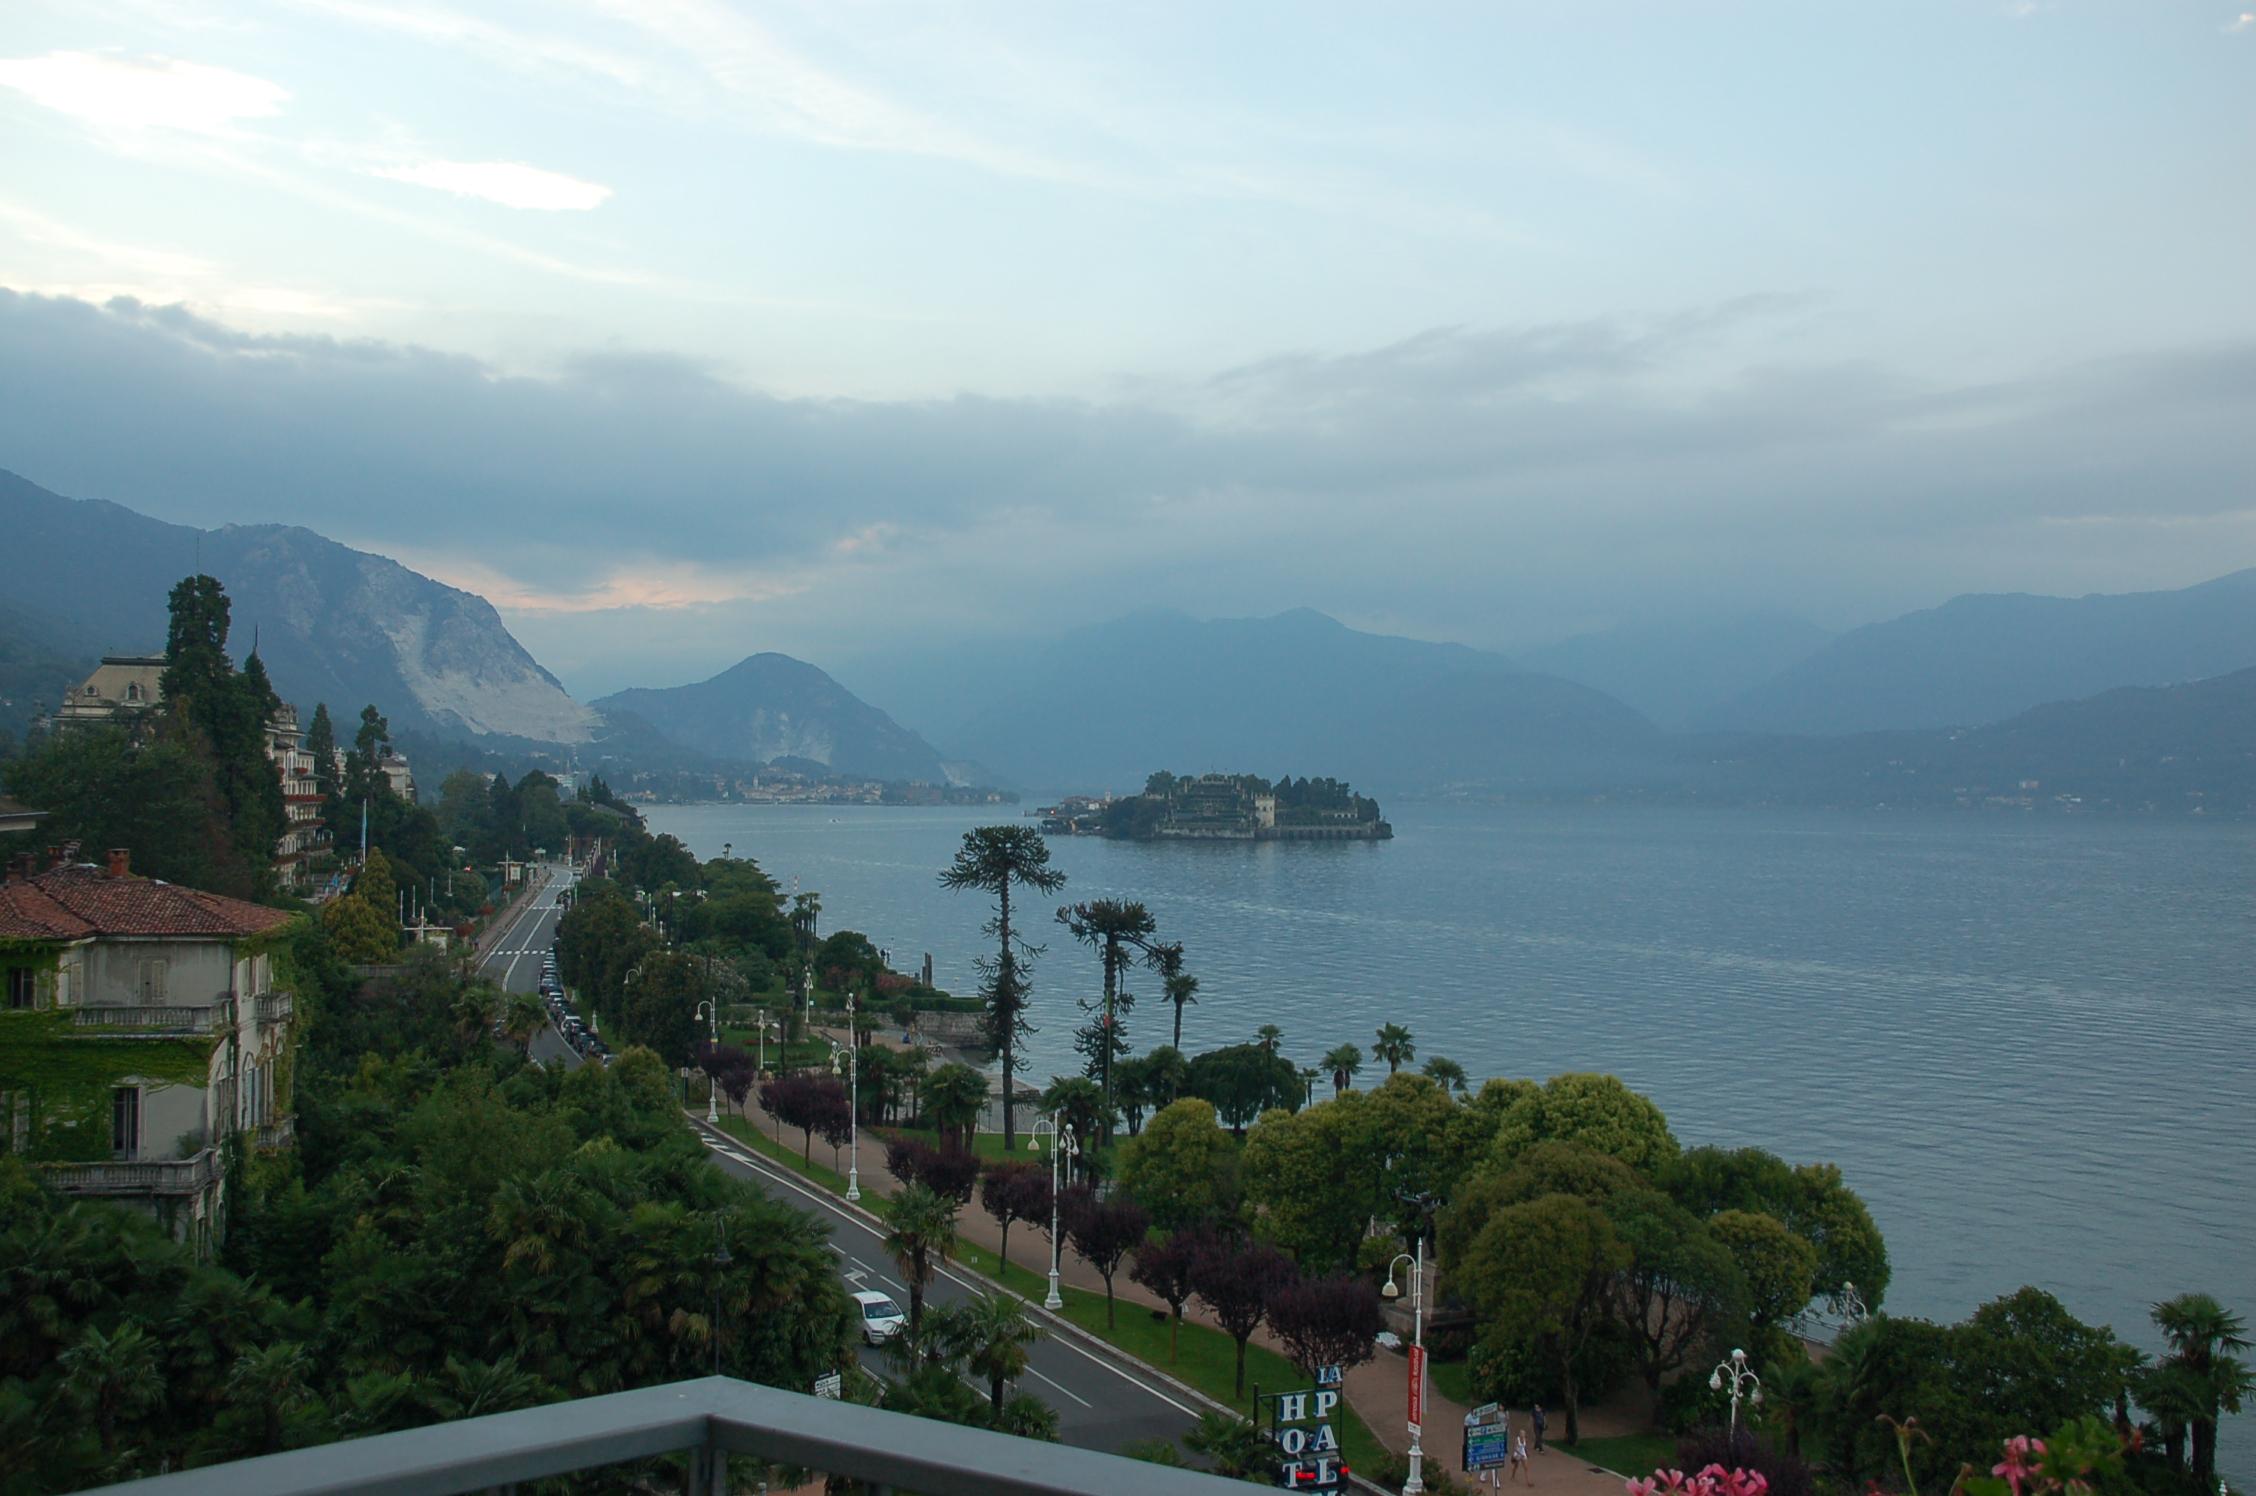 Travel Guide To Lago Maggiore Italy Dvir Reznik The